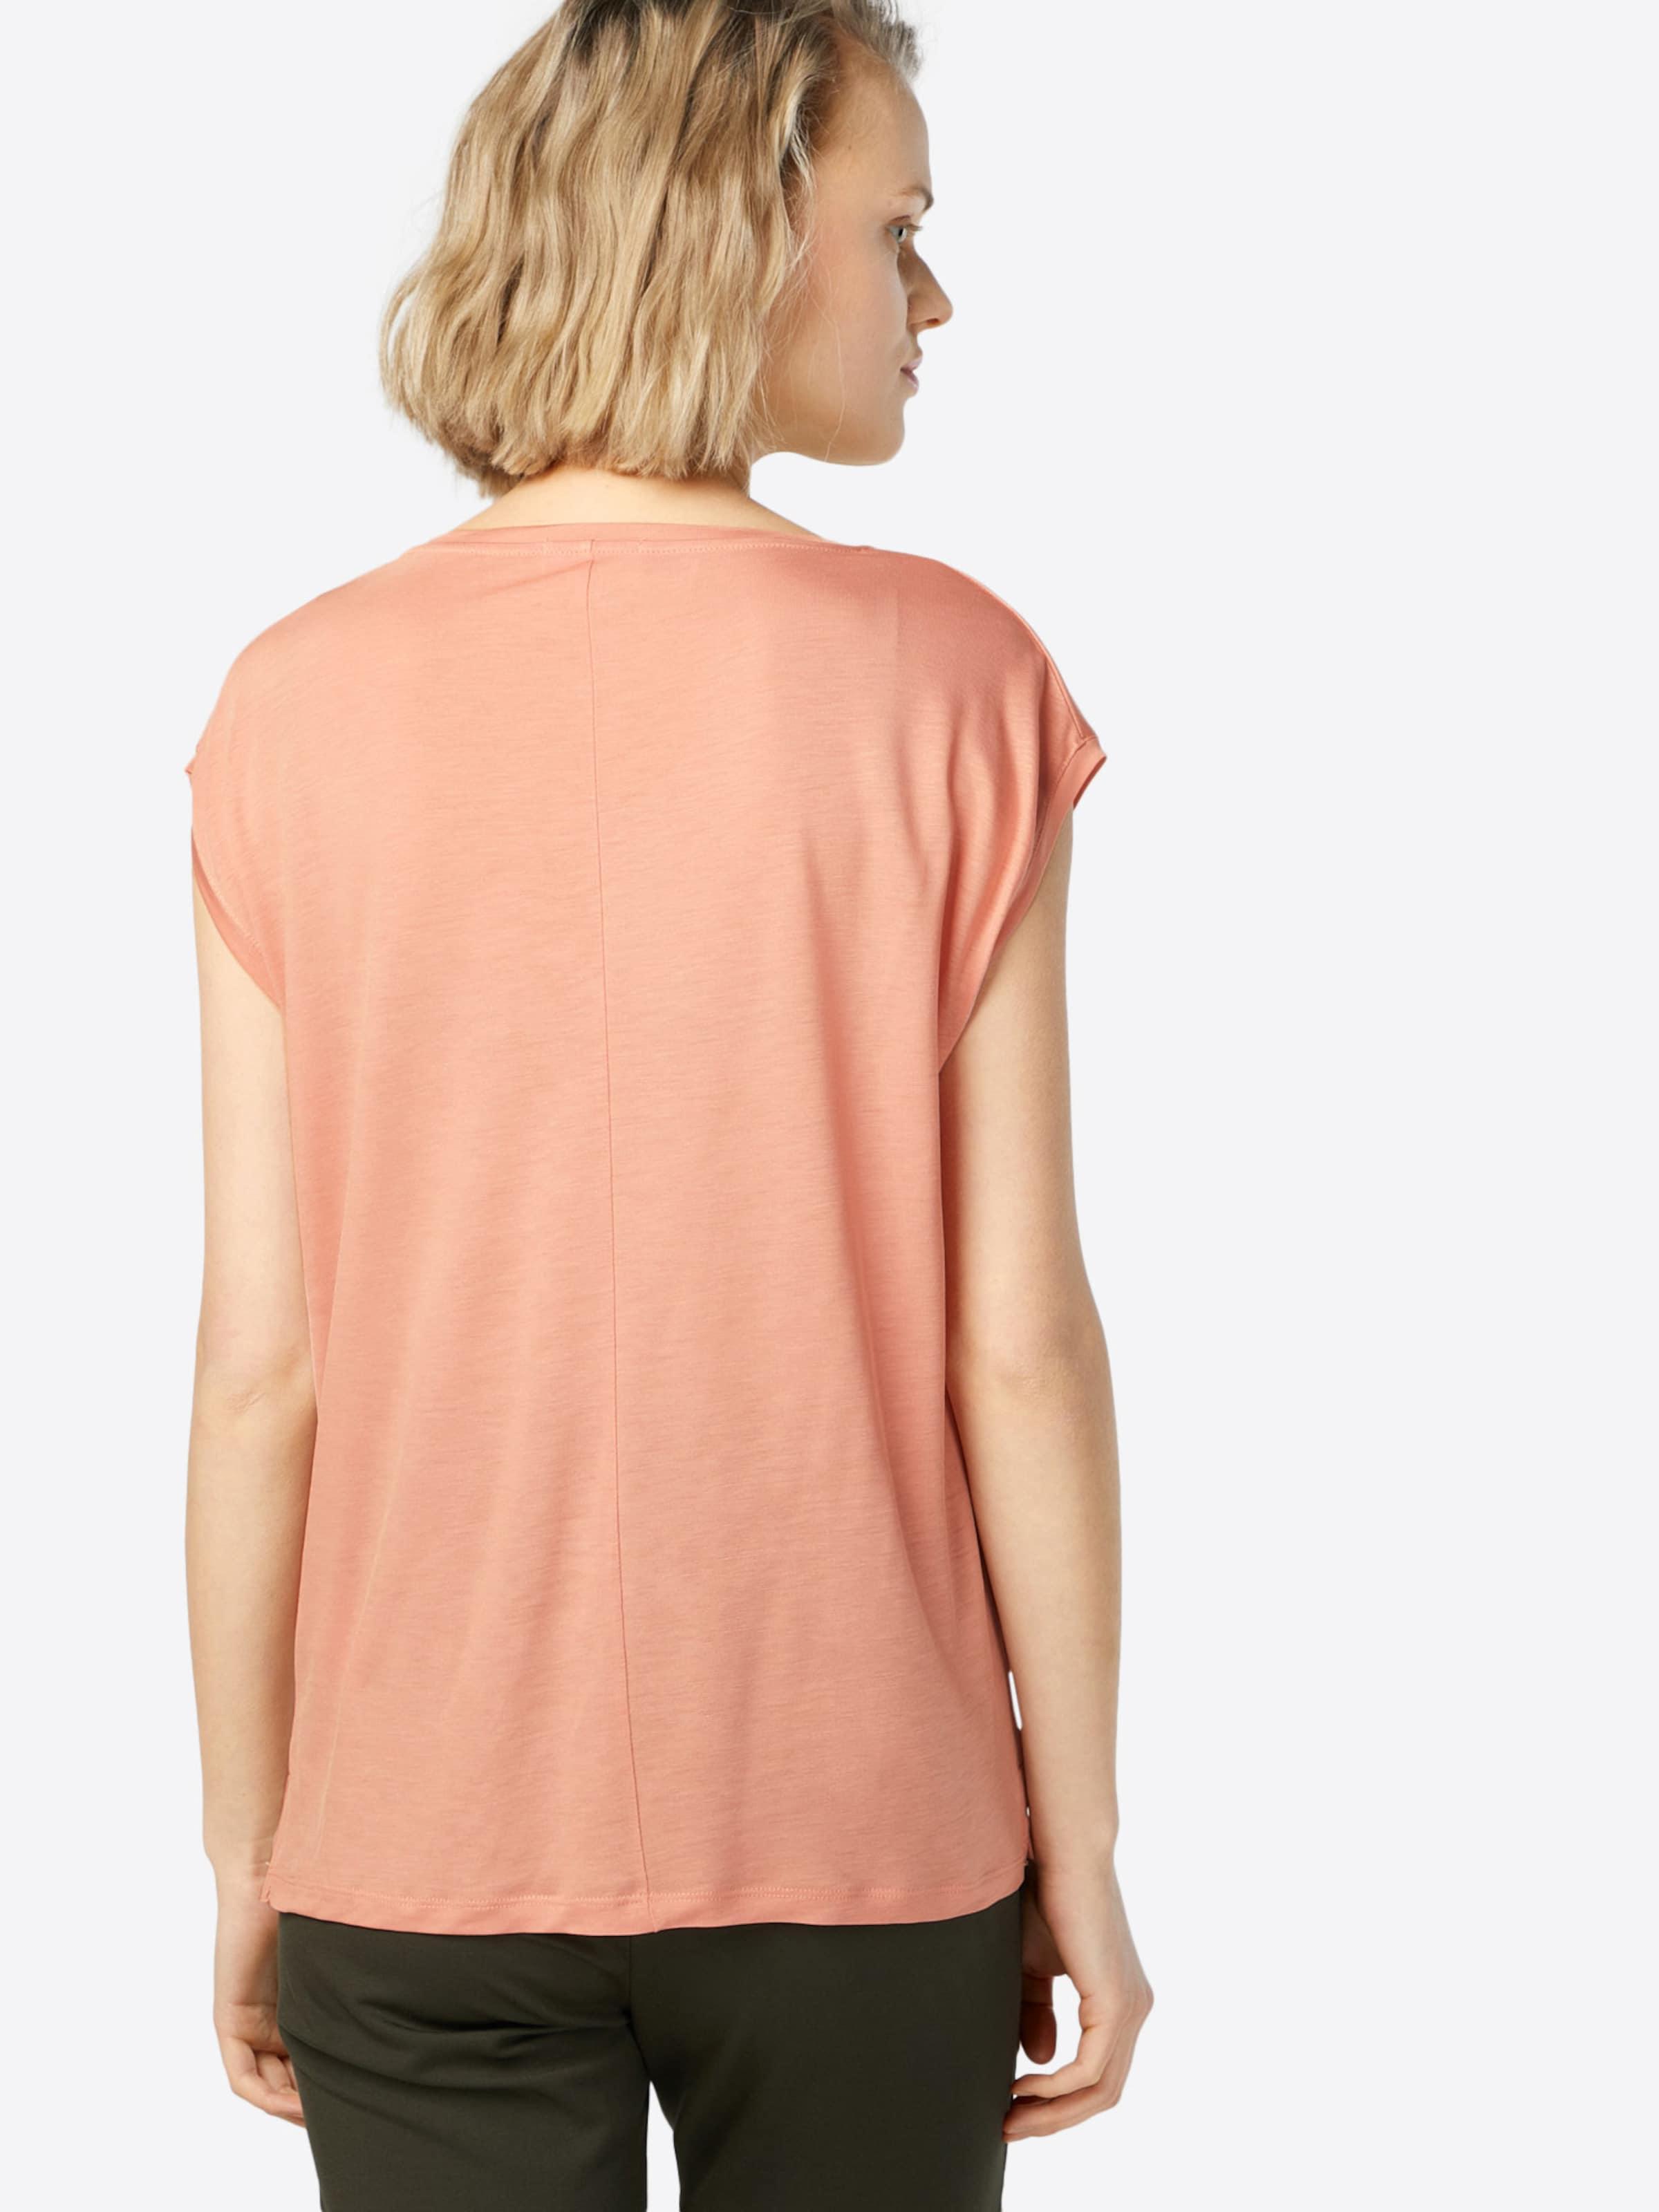 armedangels Shirt 'Jil' Online Einkaufen dkRuHRk